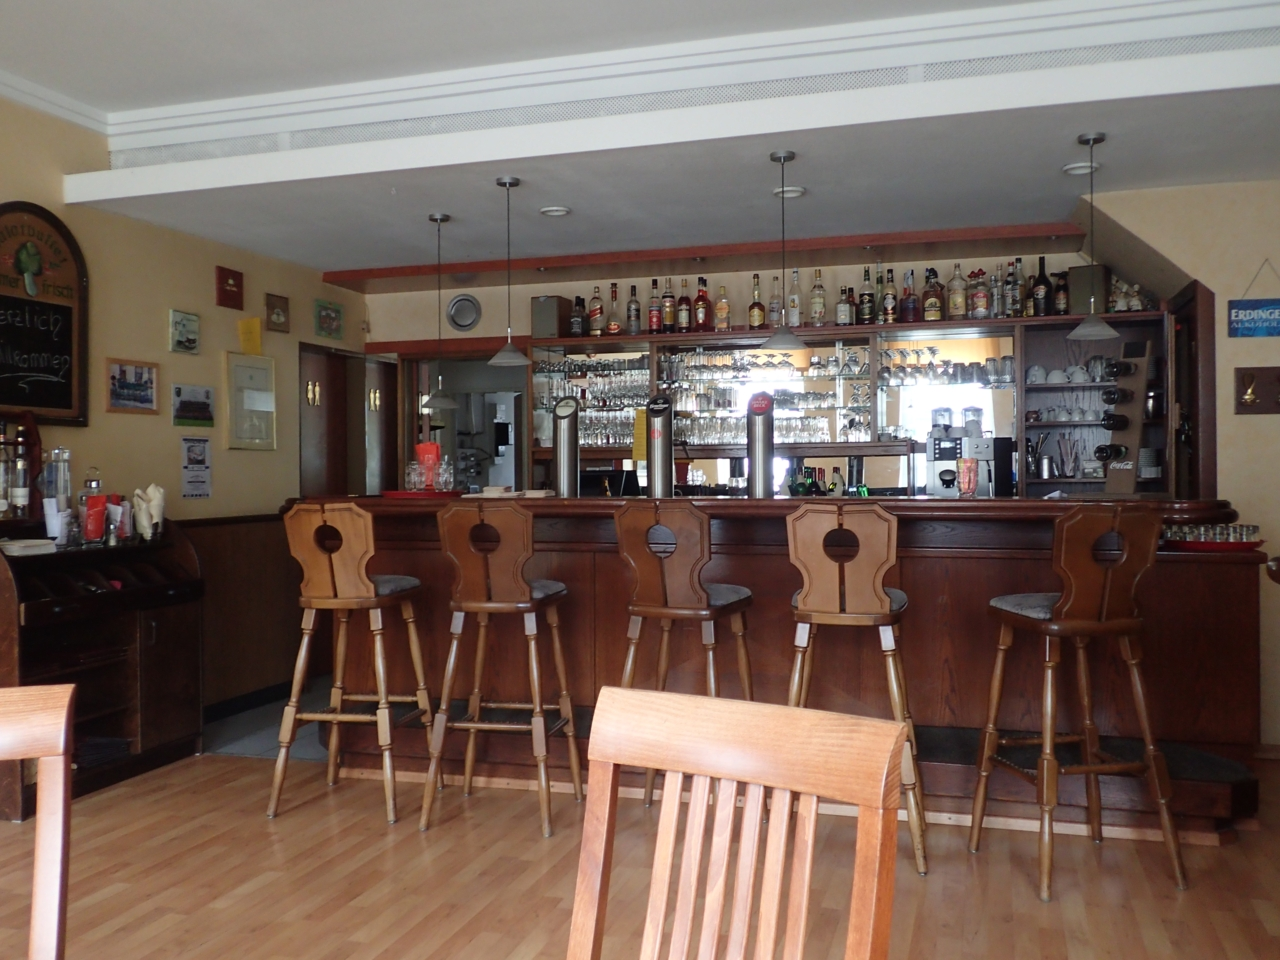 Tarmstedt bar